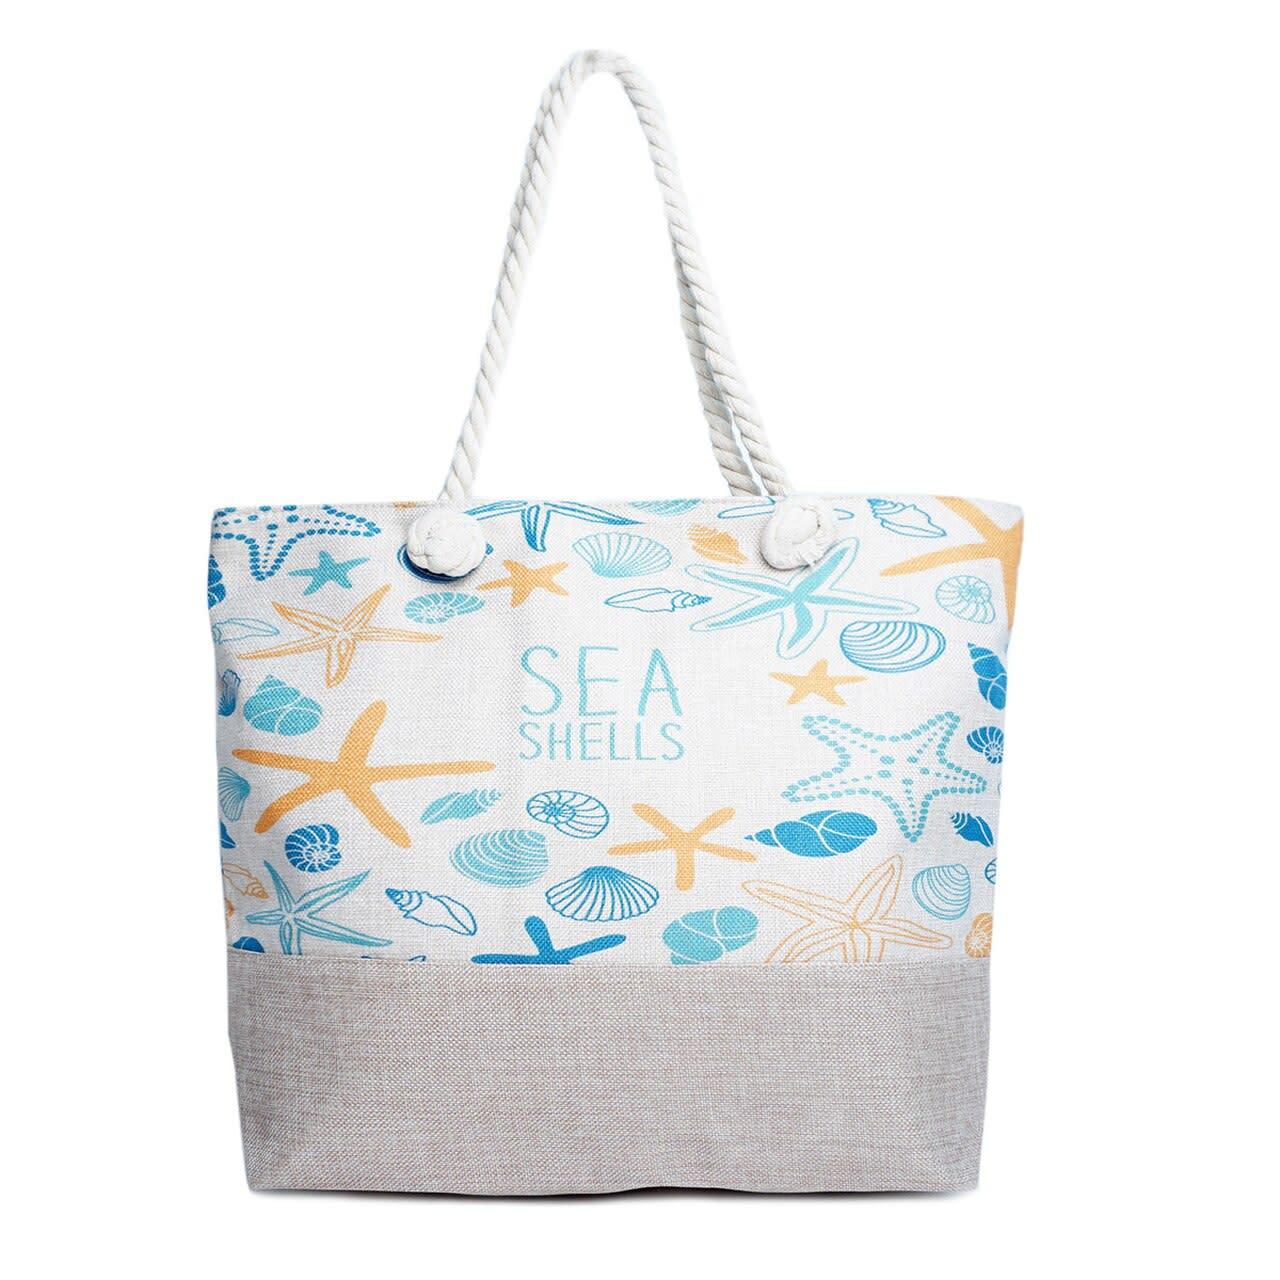 Sea Shells Tote Bag - Light Beige - Front